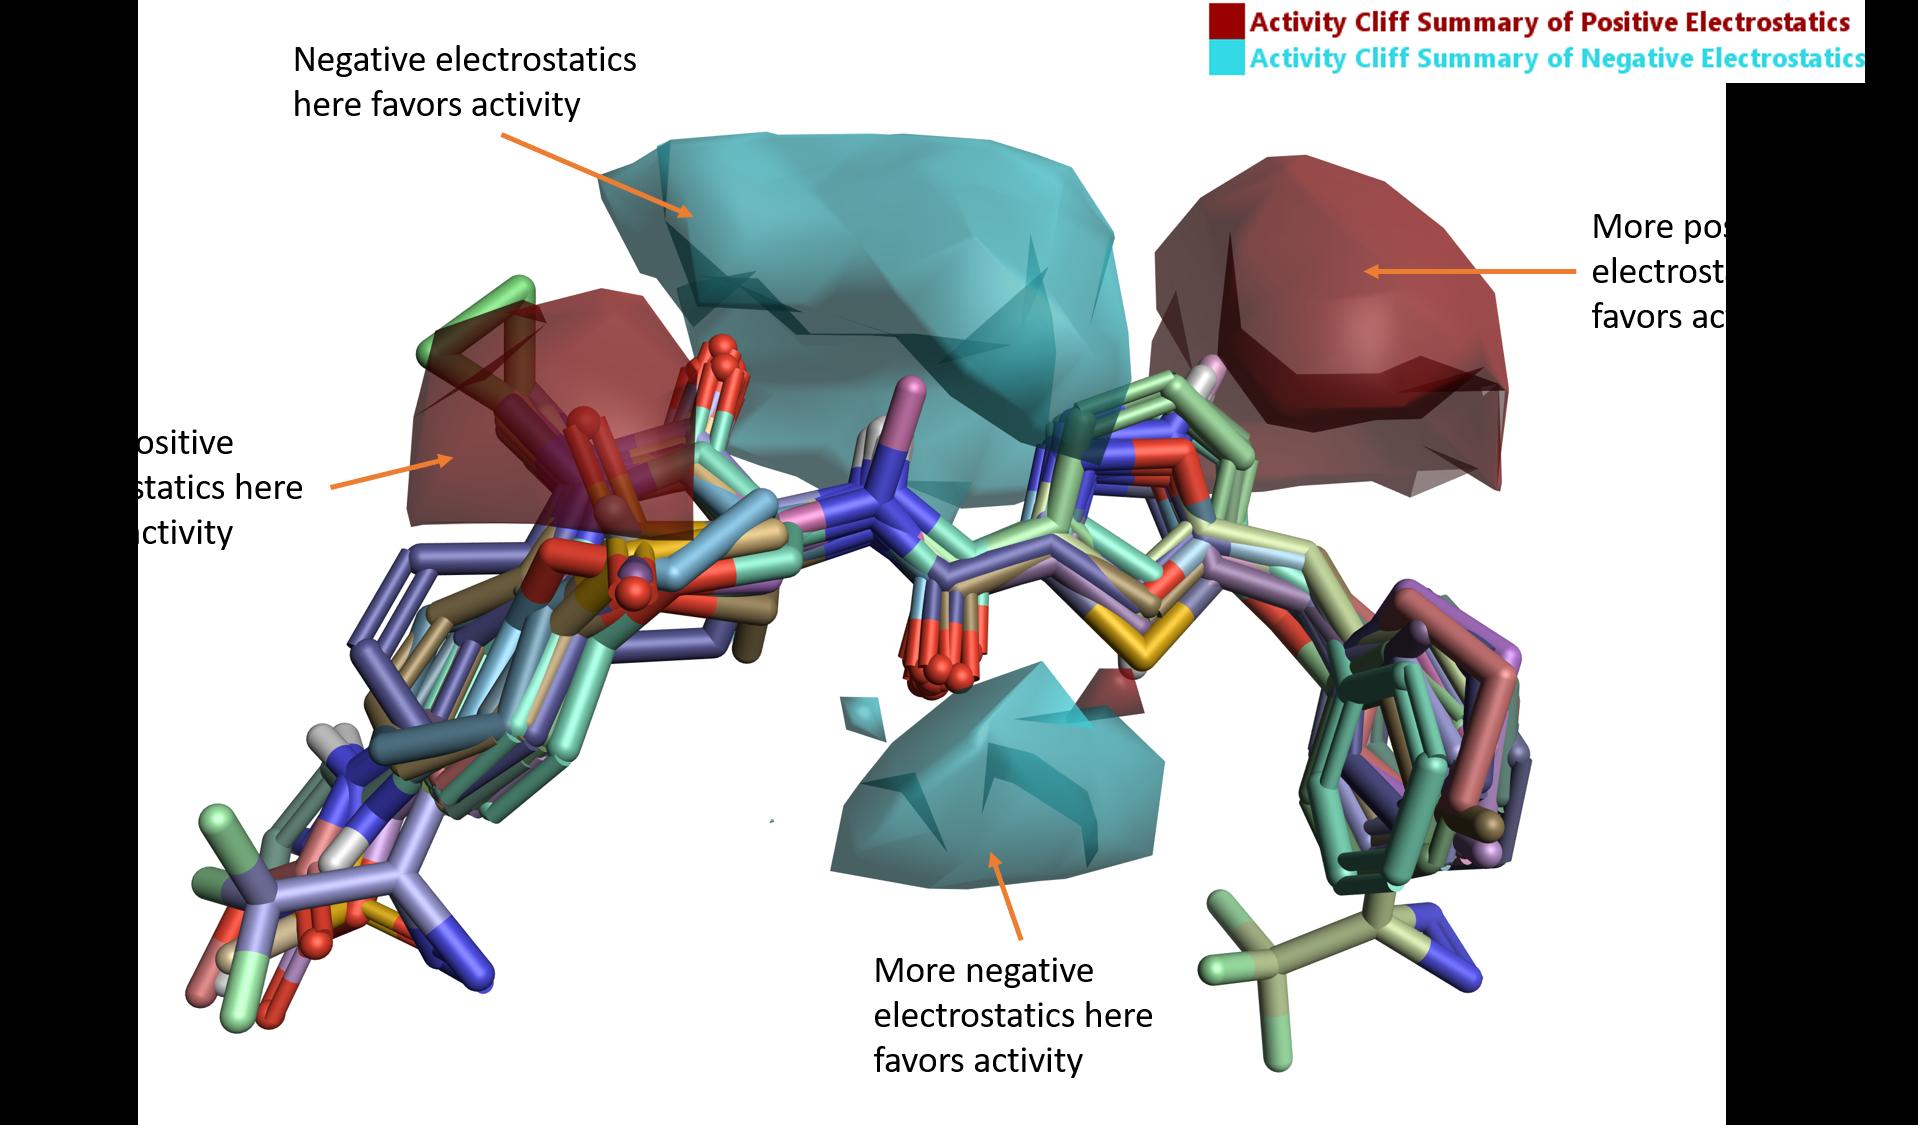 Figure 5_ Activity Cliff summary of electrostatics map for RIPK1